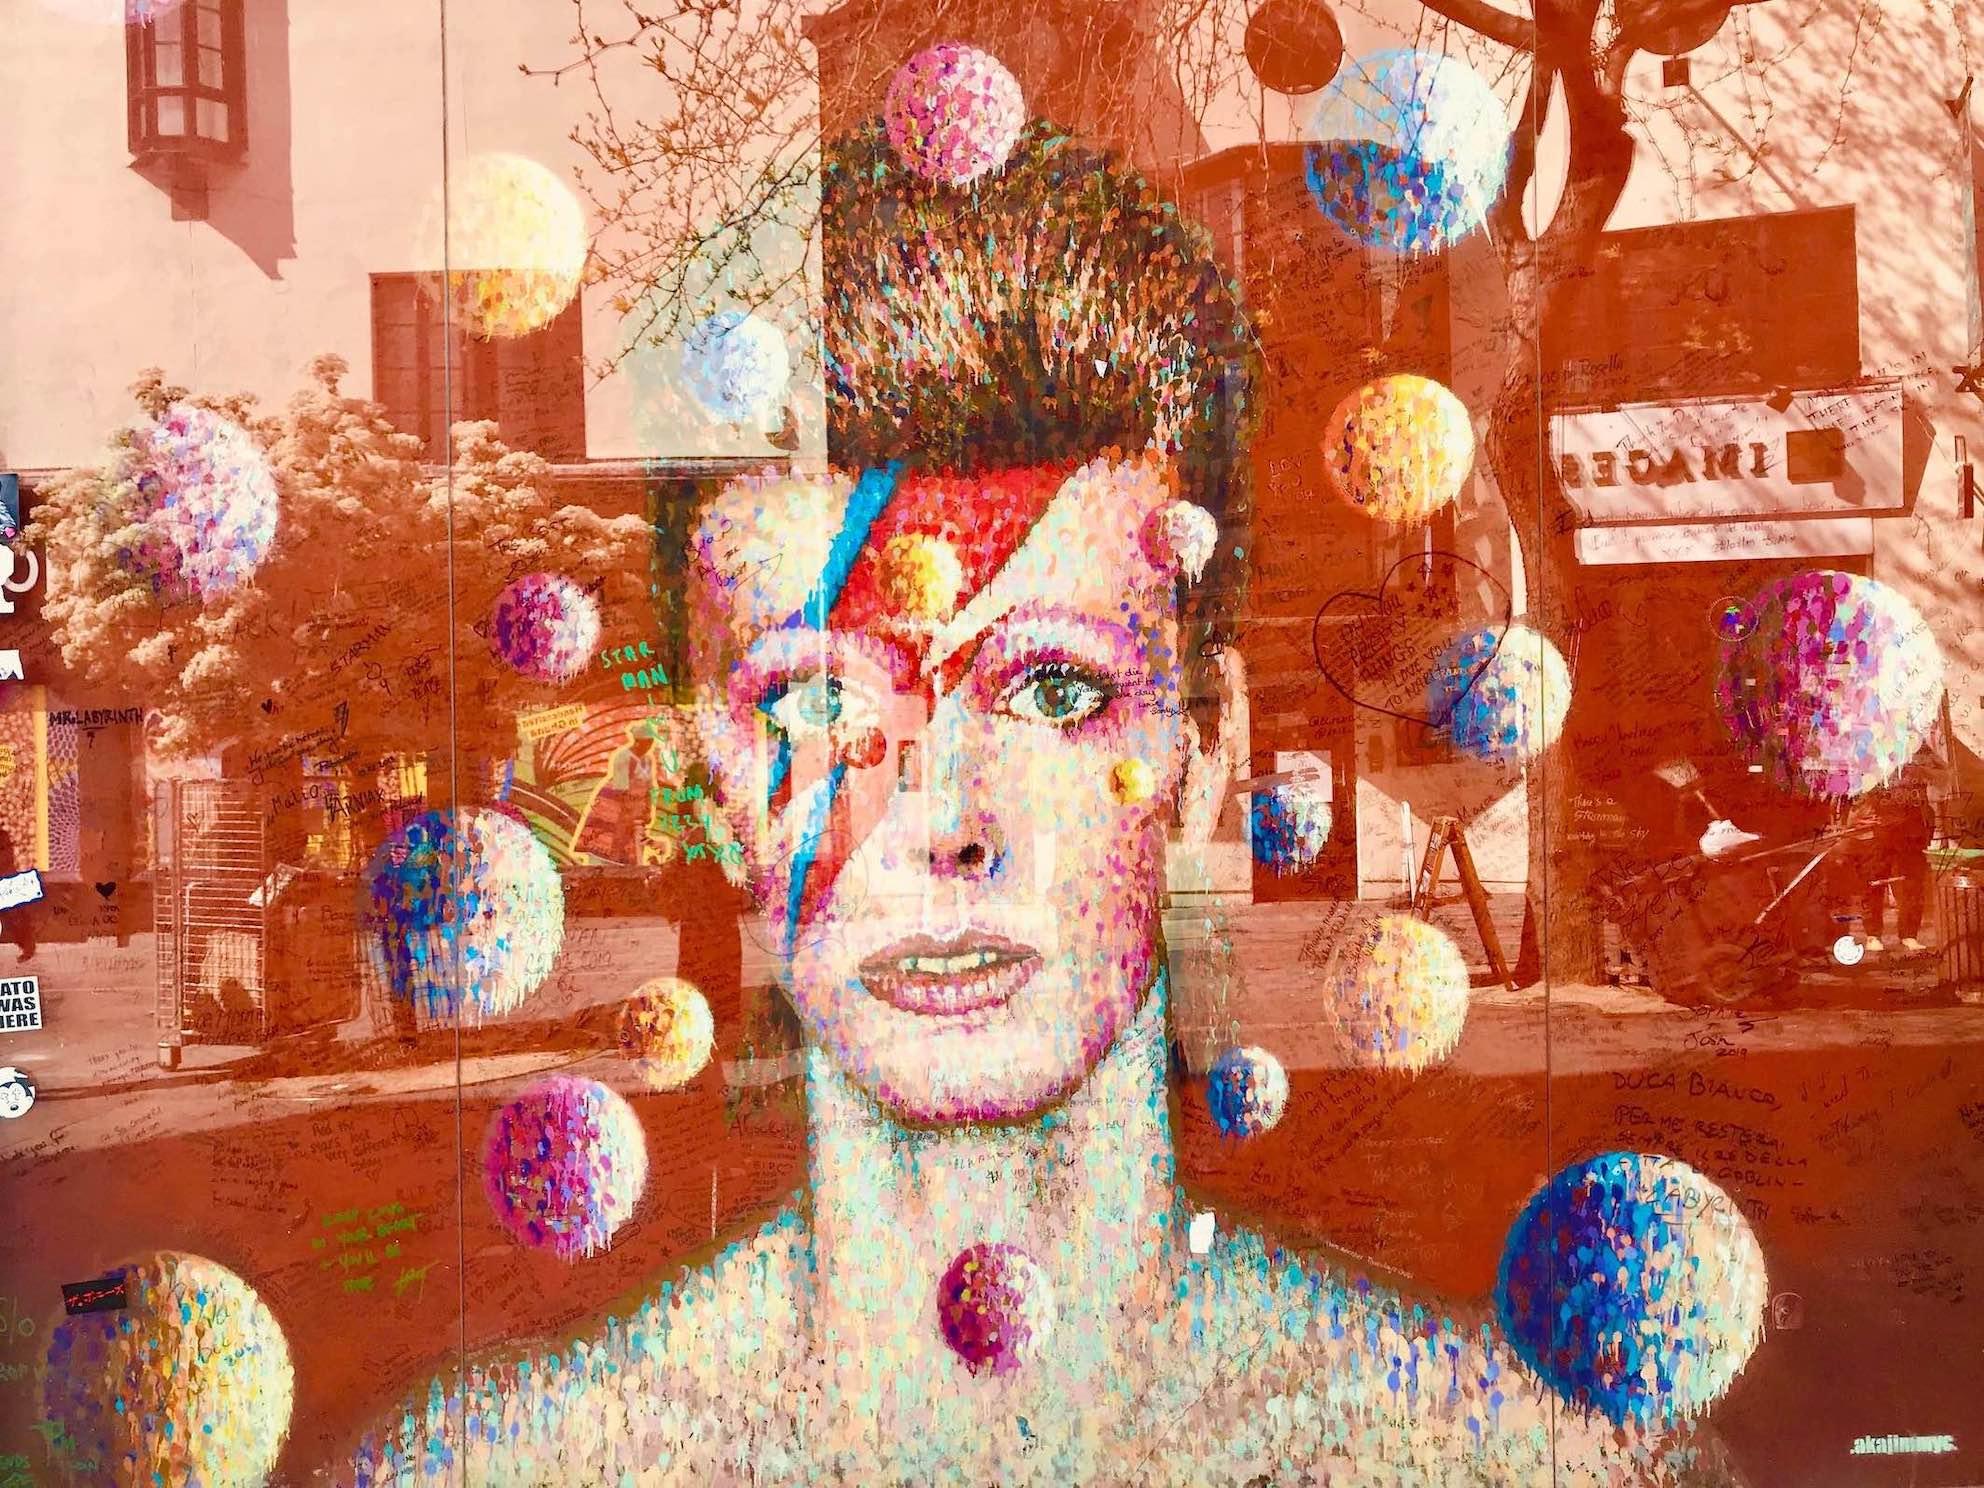 David Bowie Mural London.